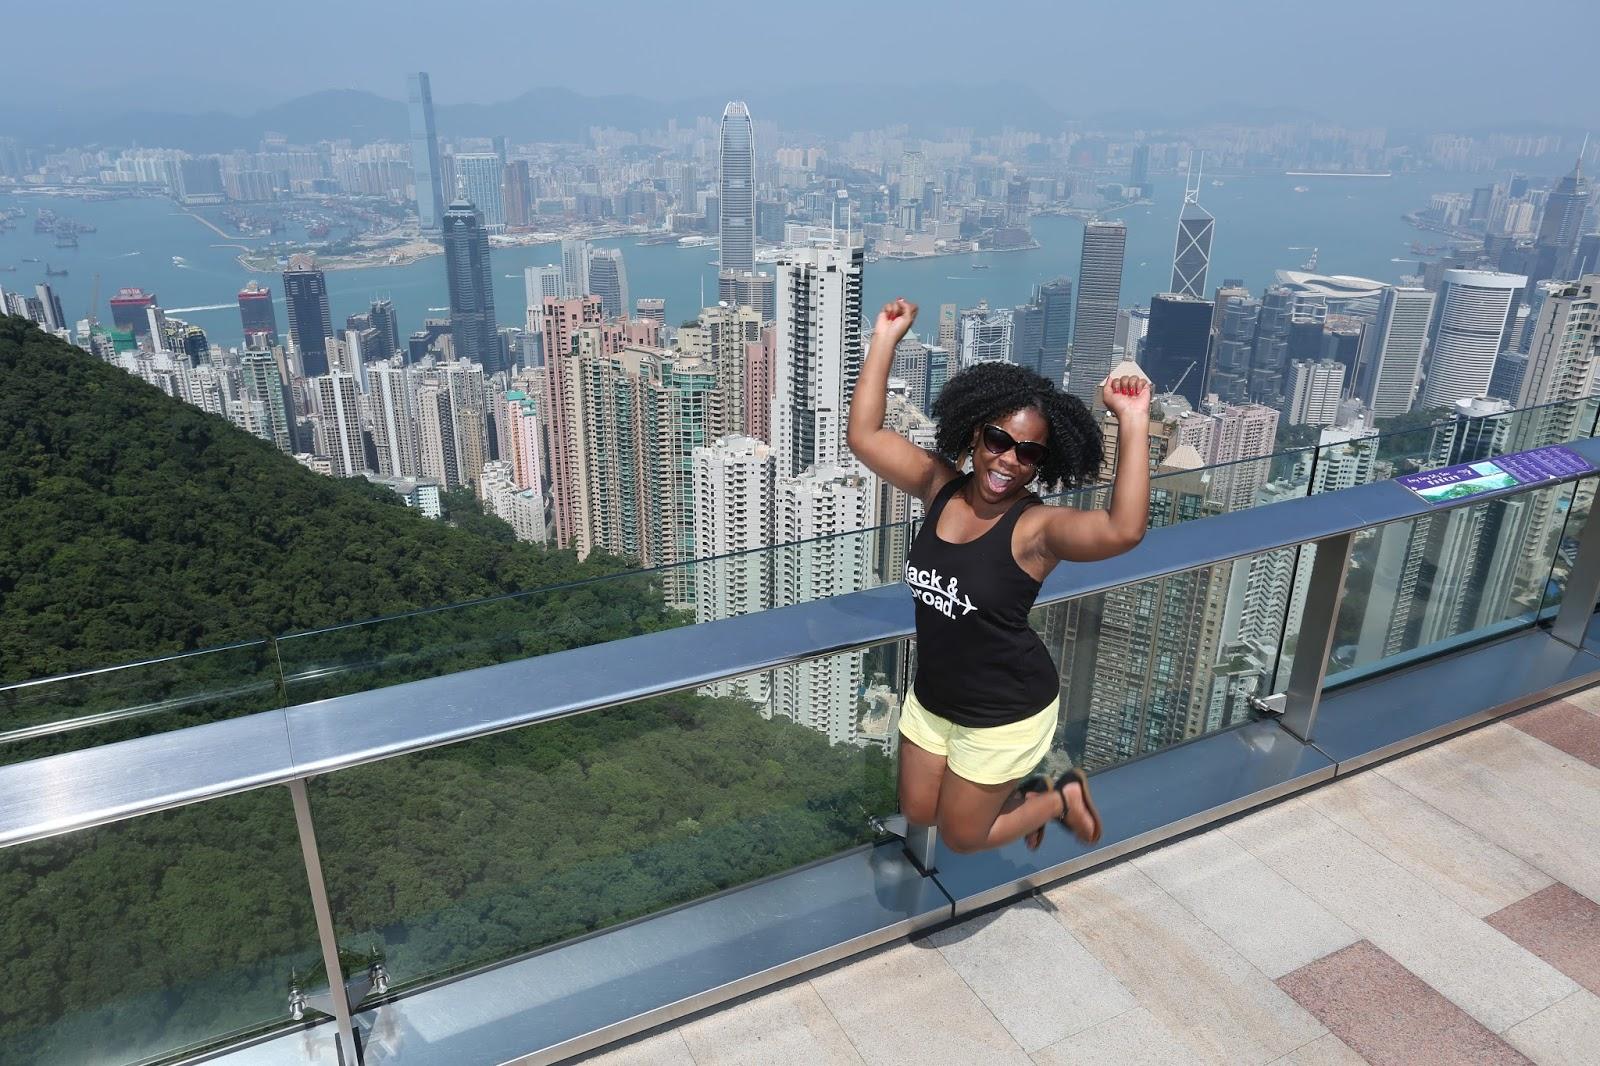 Expat Travels: Hong Kong! - An Introvert Abroad